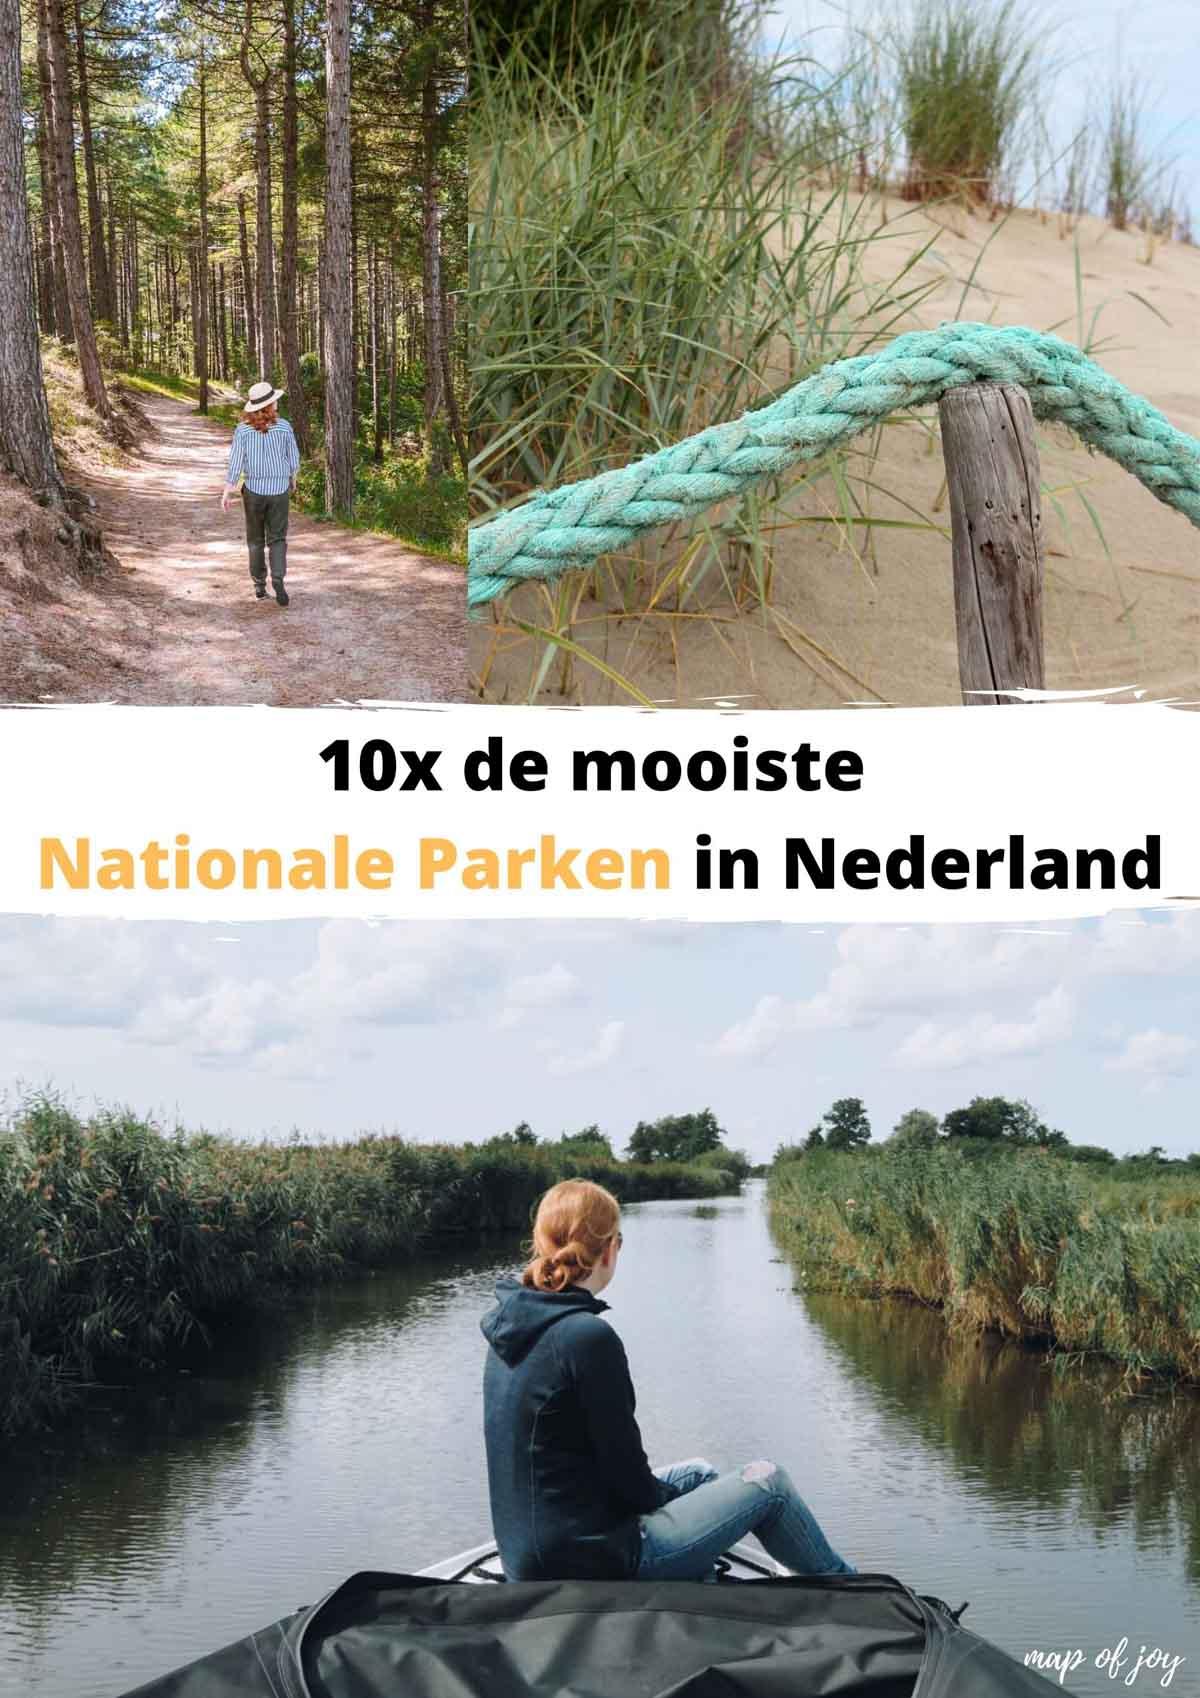 10x de mooiste Nationale Parken in Nederland